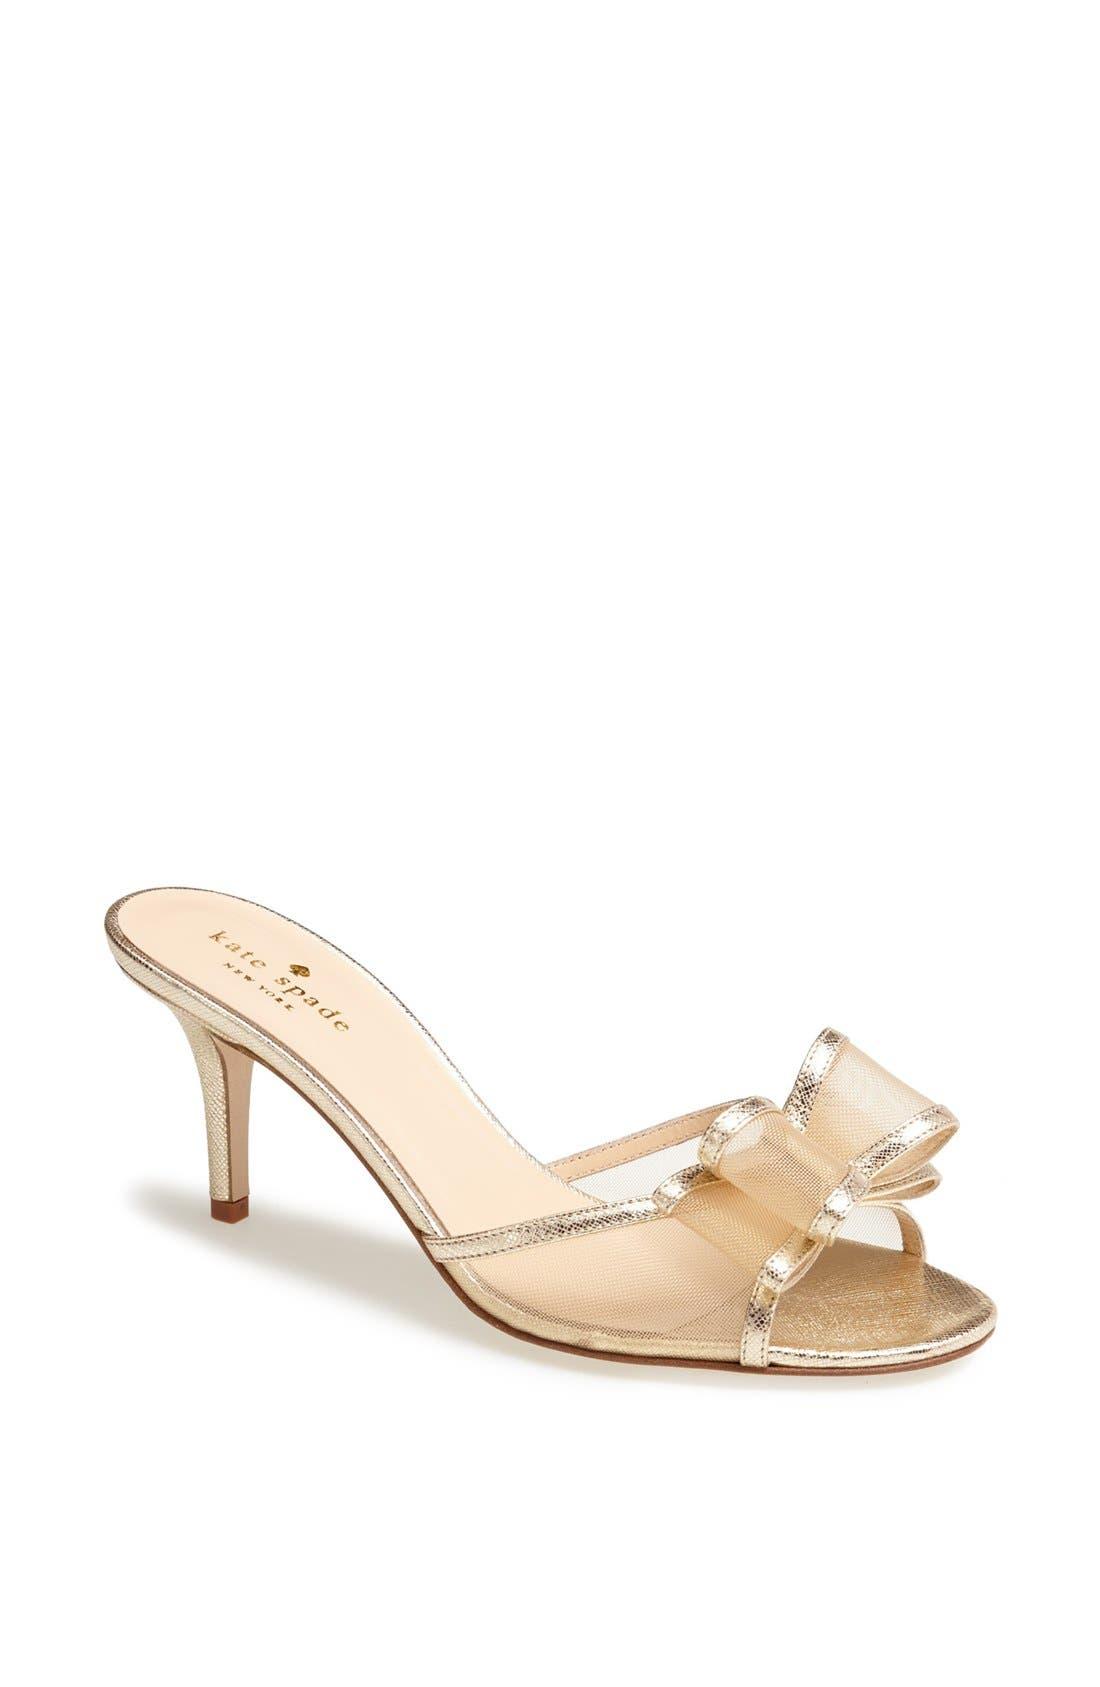 Alternate Image 1 Selected - kate spade new york 'michaela' sandal